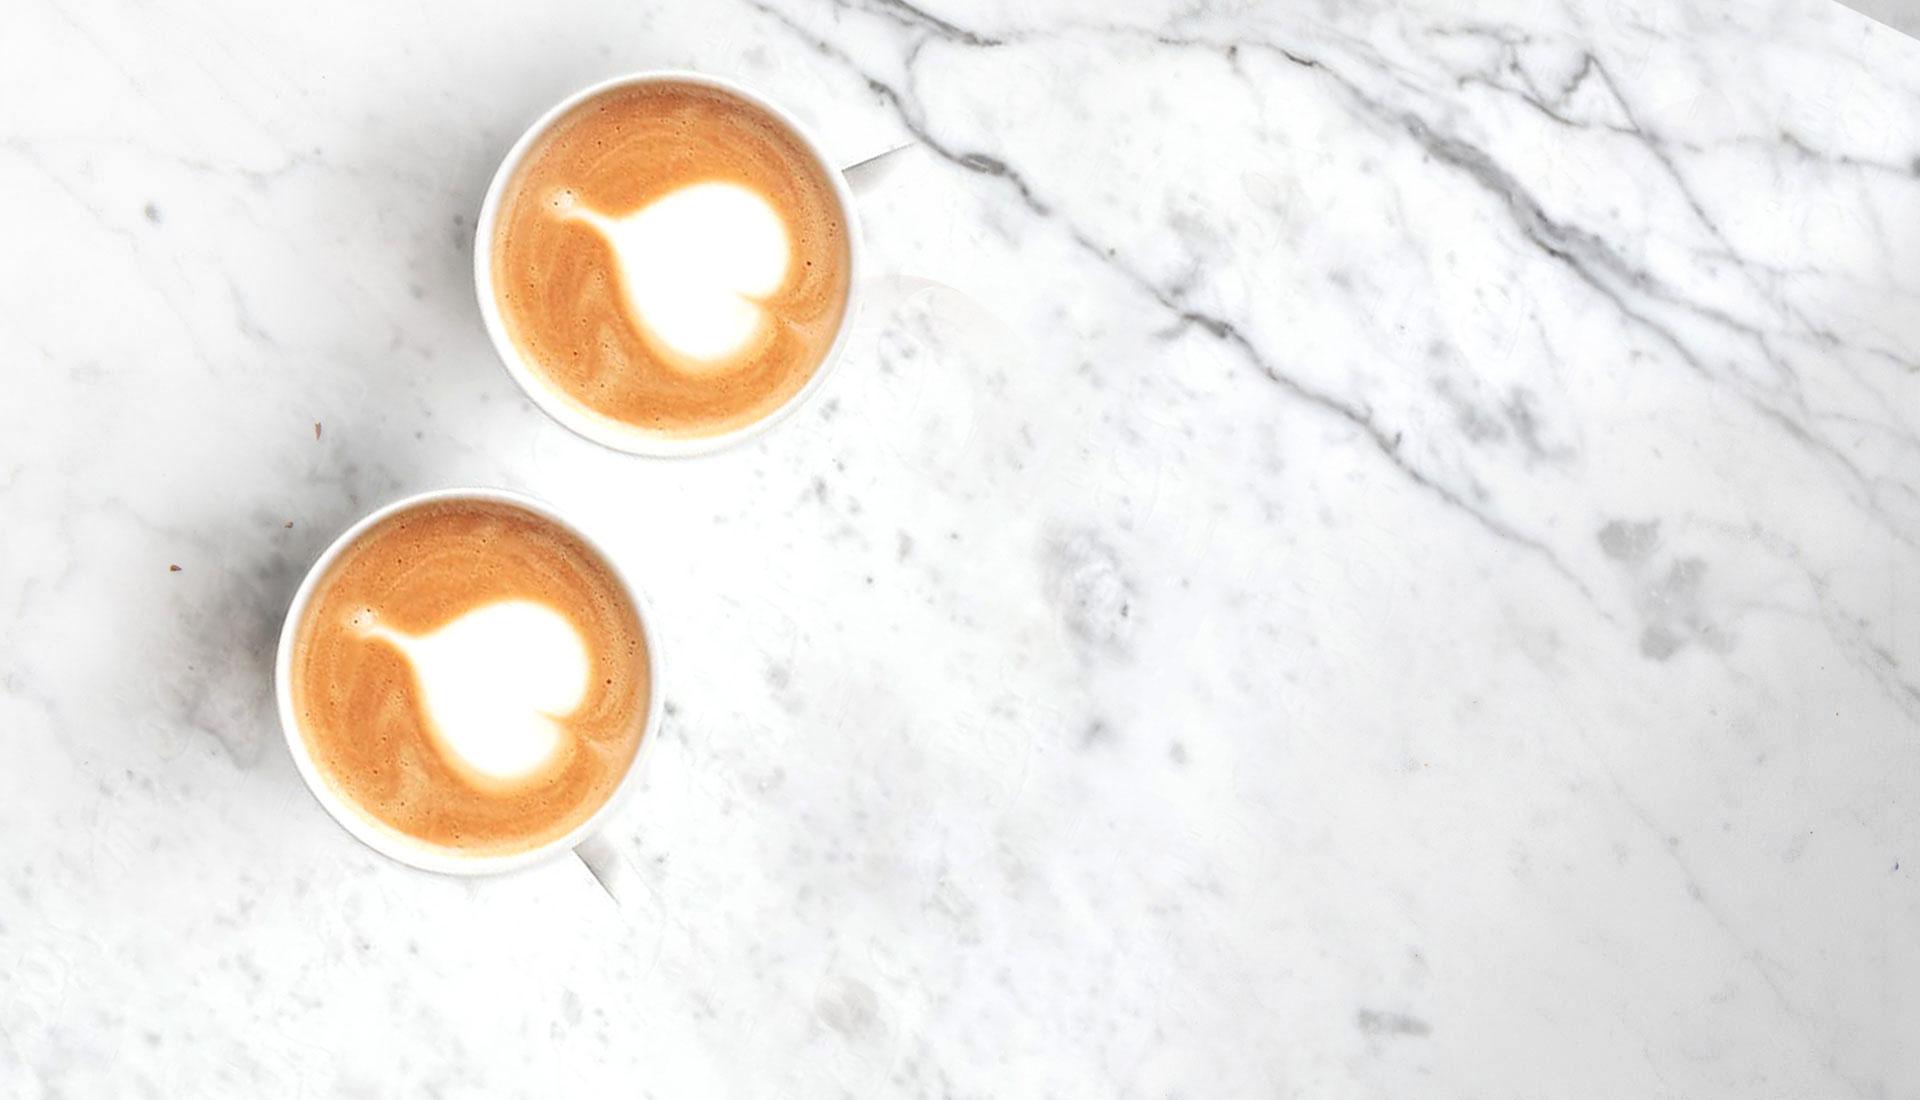 italien Cappuccino und Espresso von Rosso Arancio Zürich